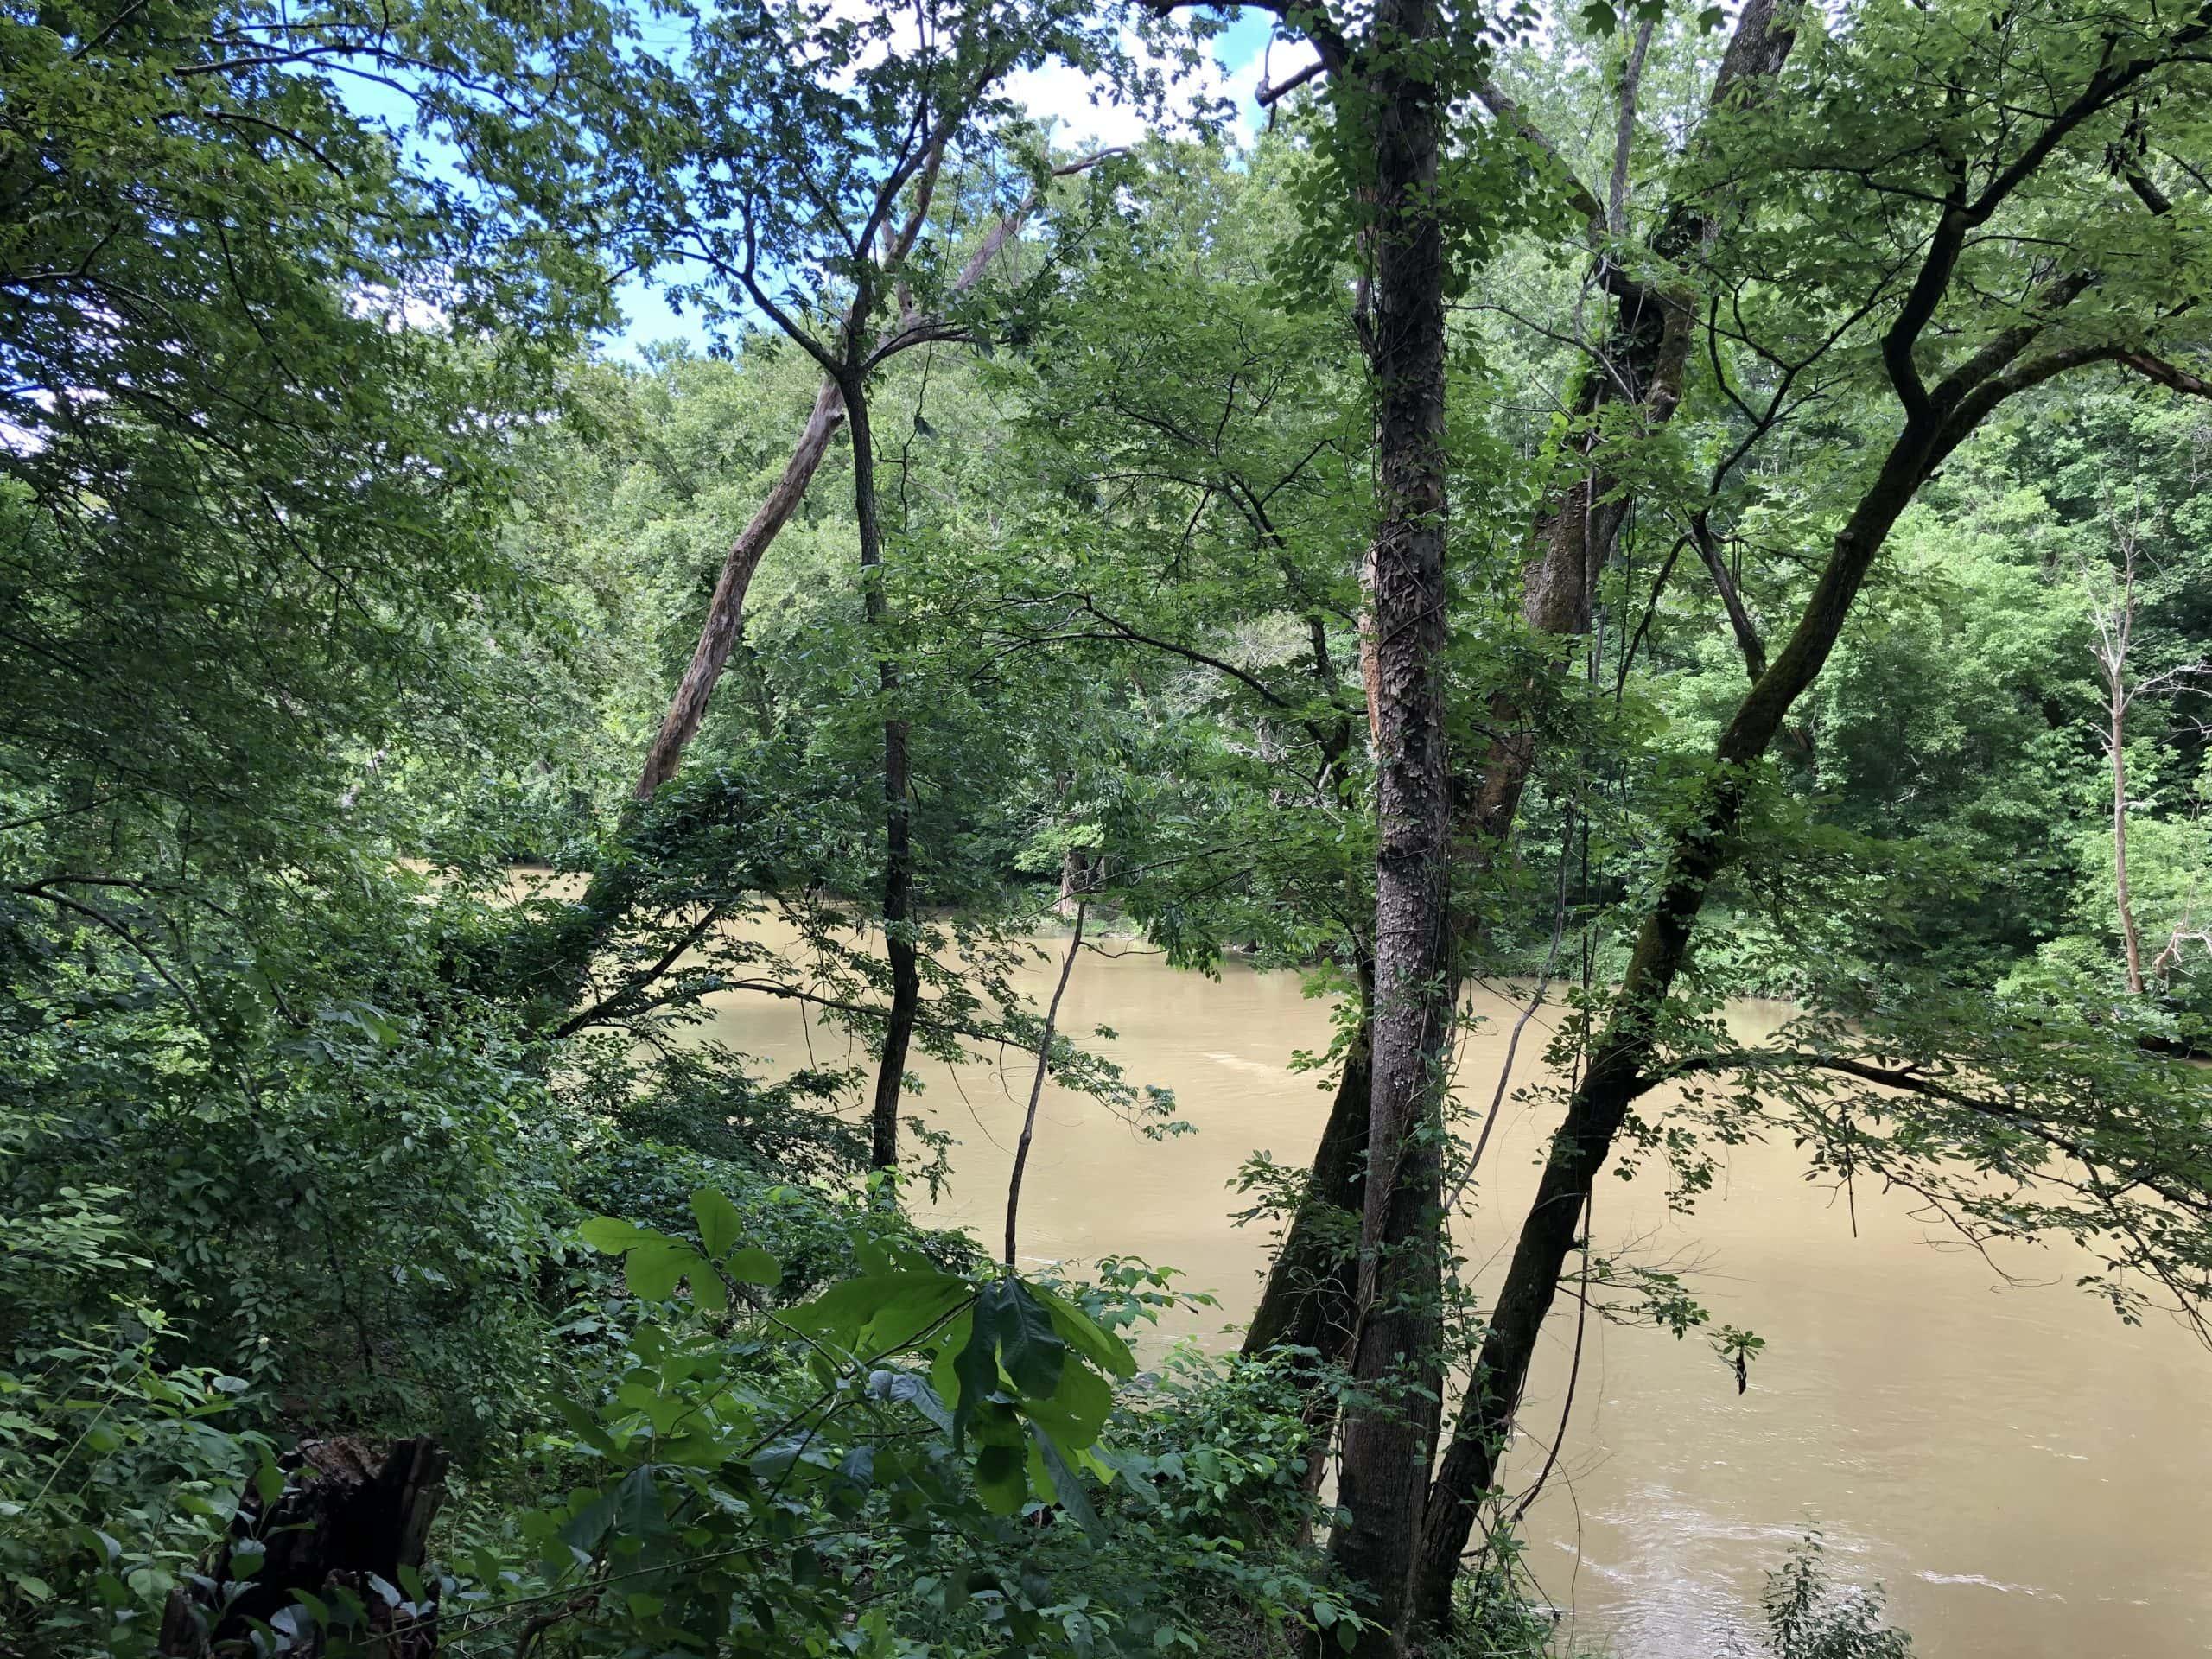 Nature Walks Near Roanoke Va - Explore Park - Yoanoke